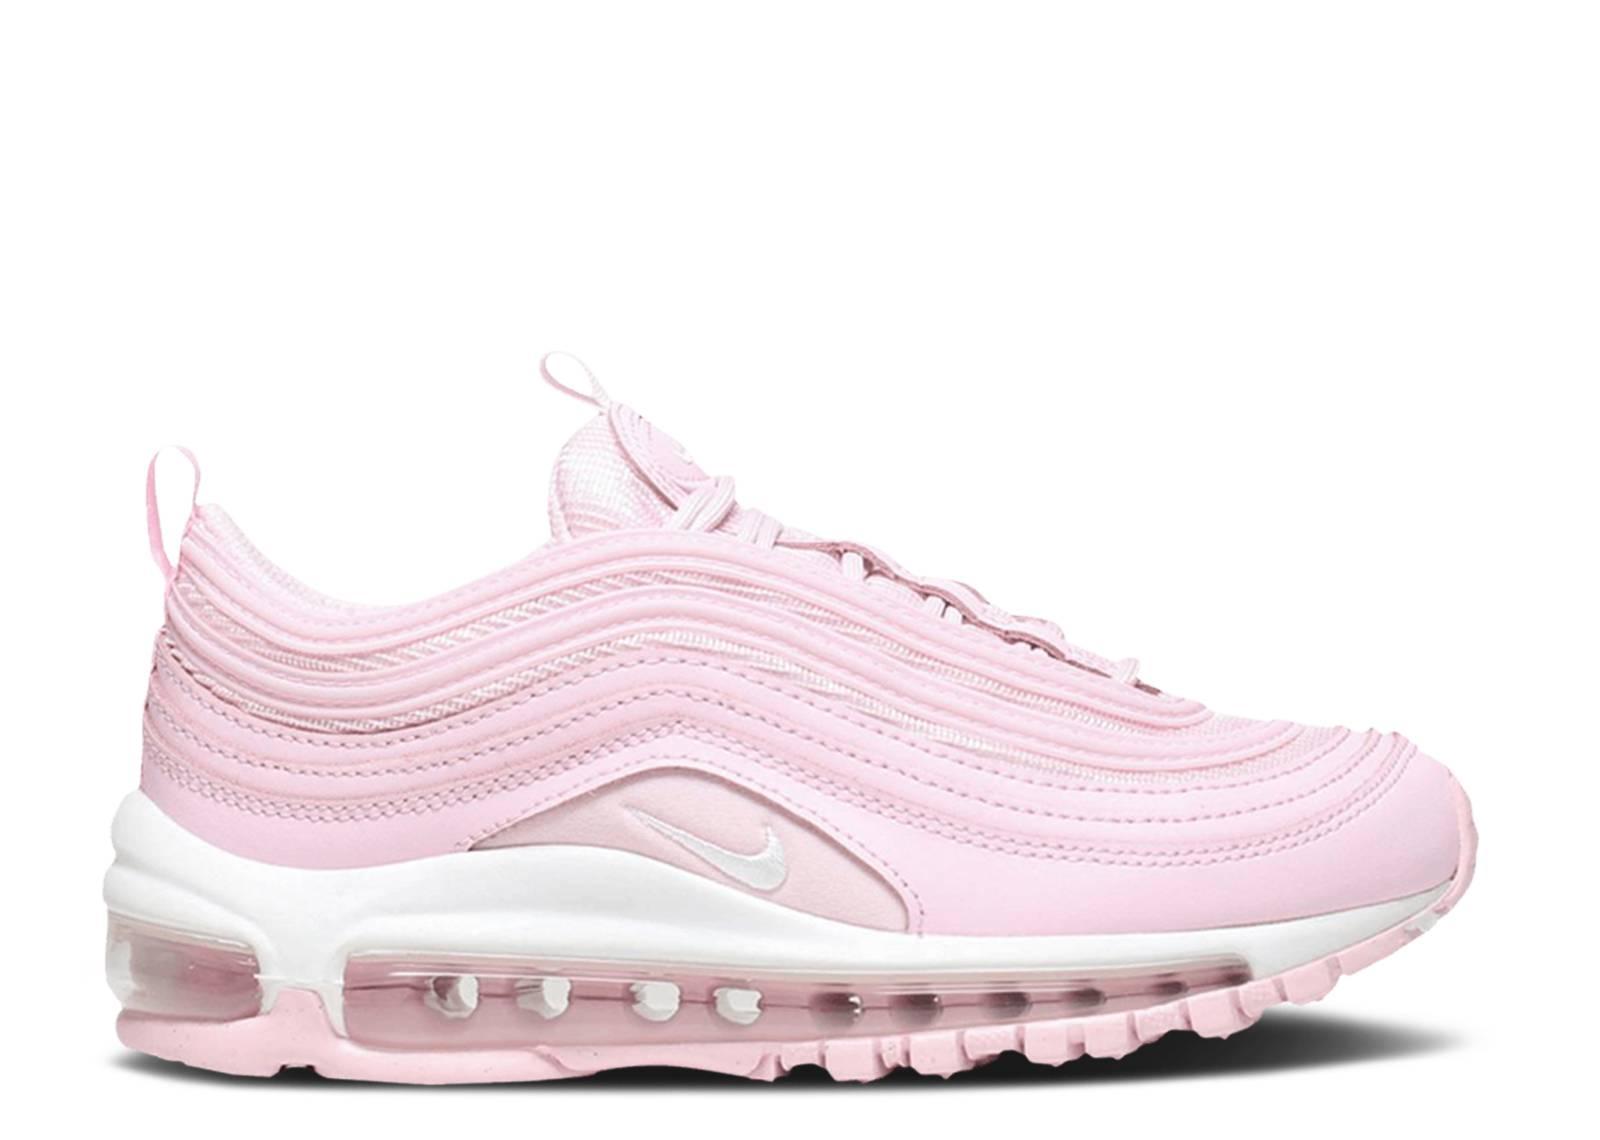 Air Max 97 GS 'Pink Foam' - Nike - CT6387 600 - pink foam/white ...